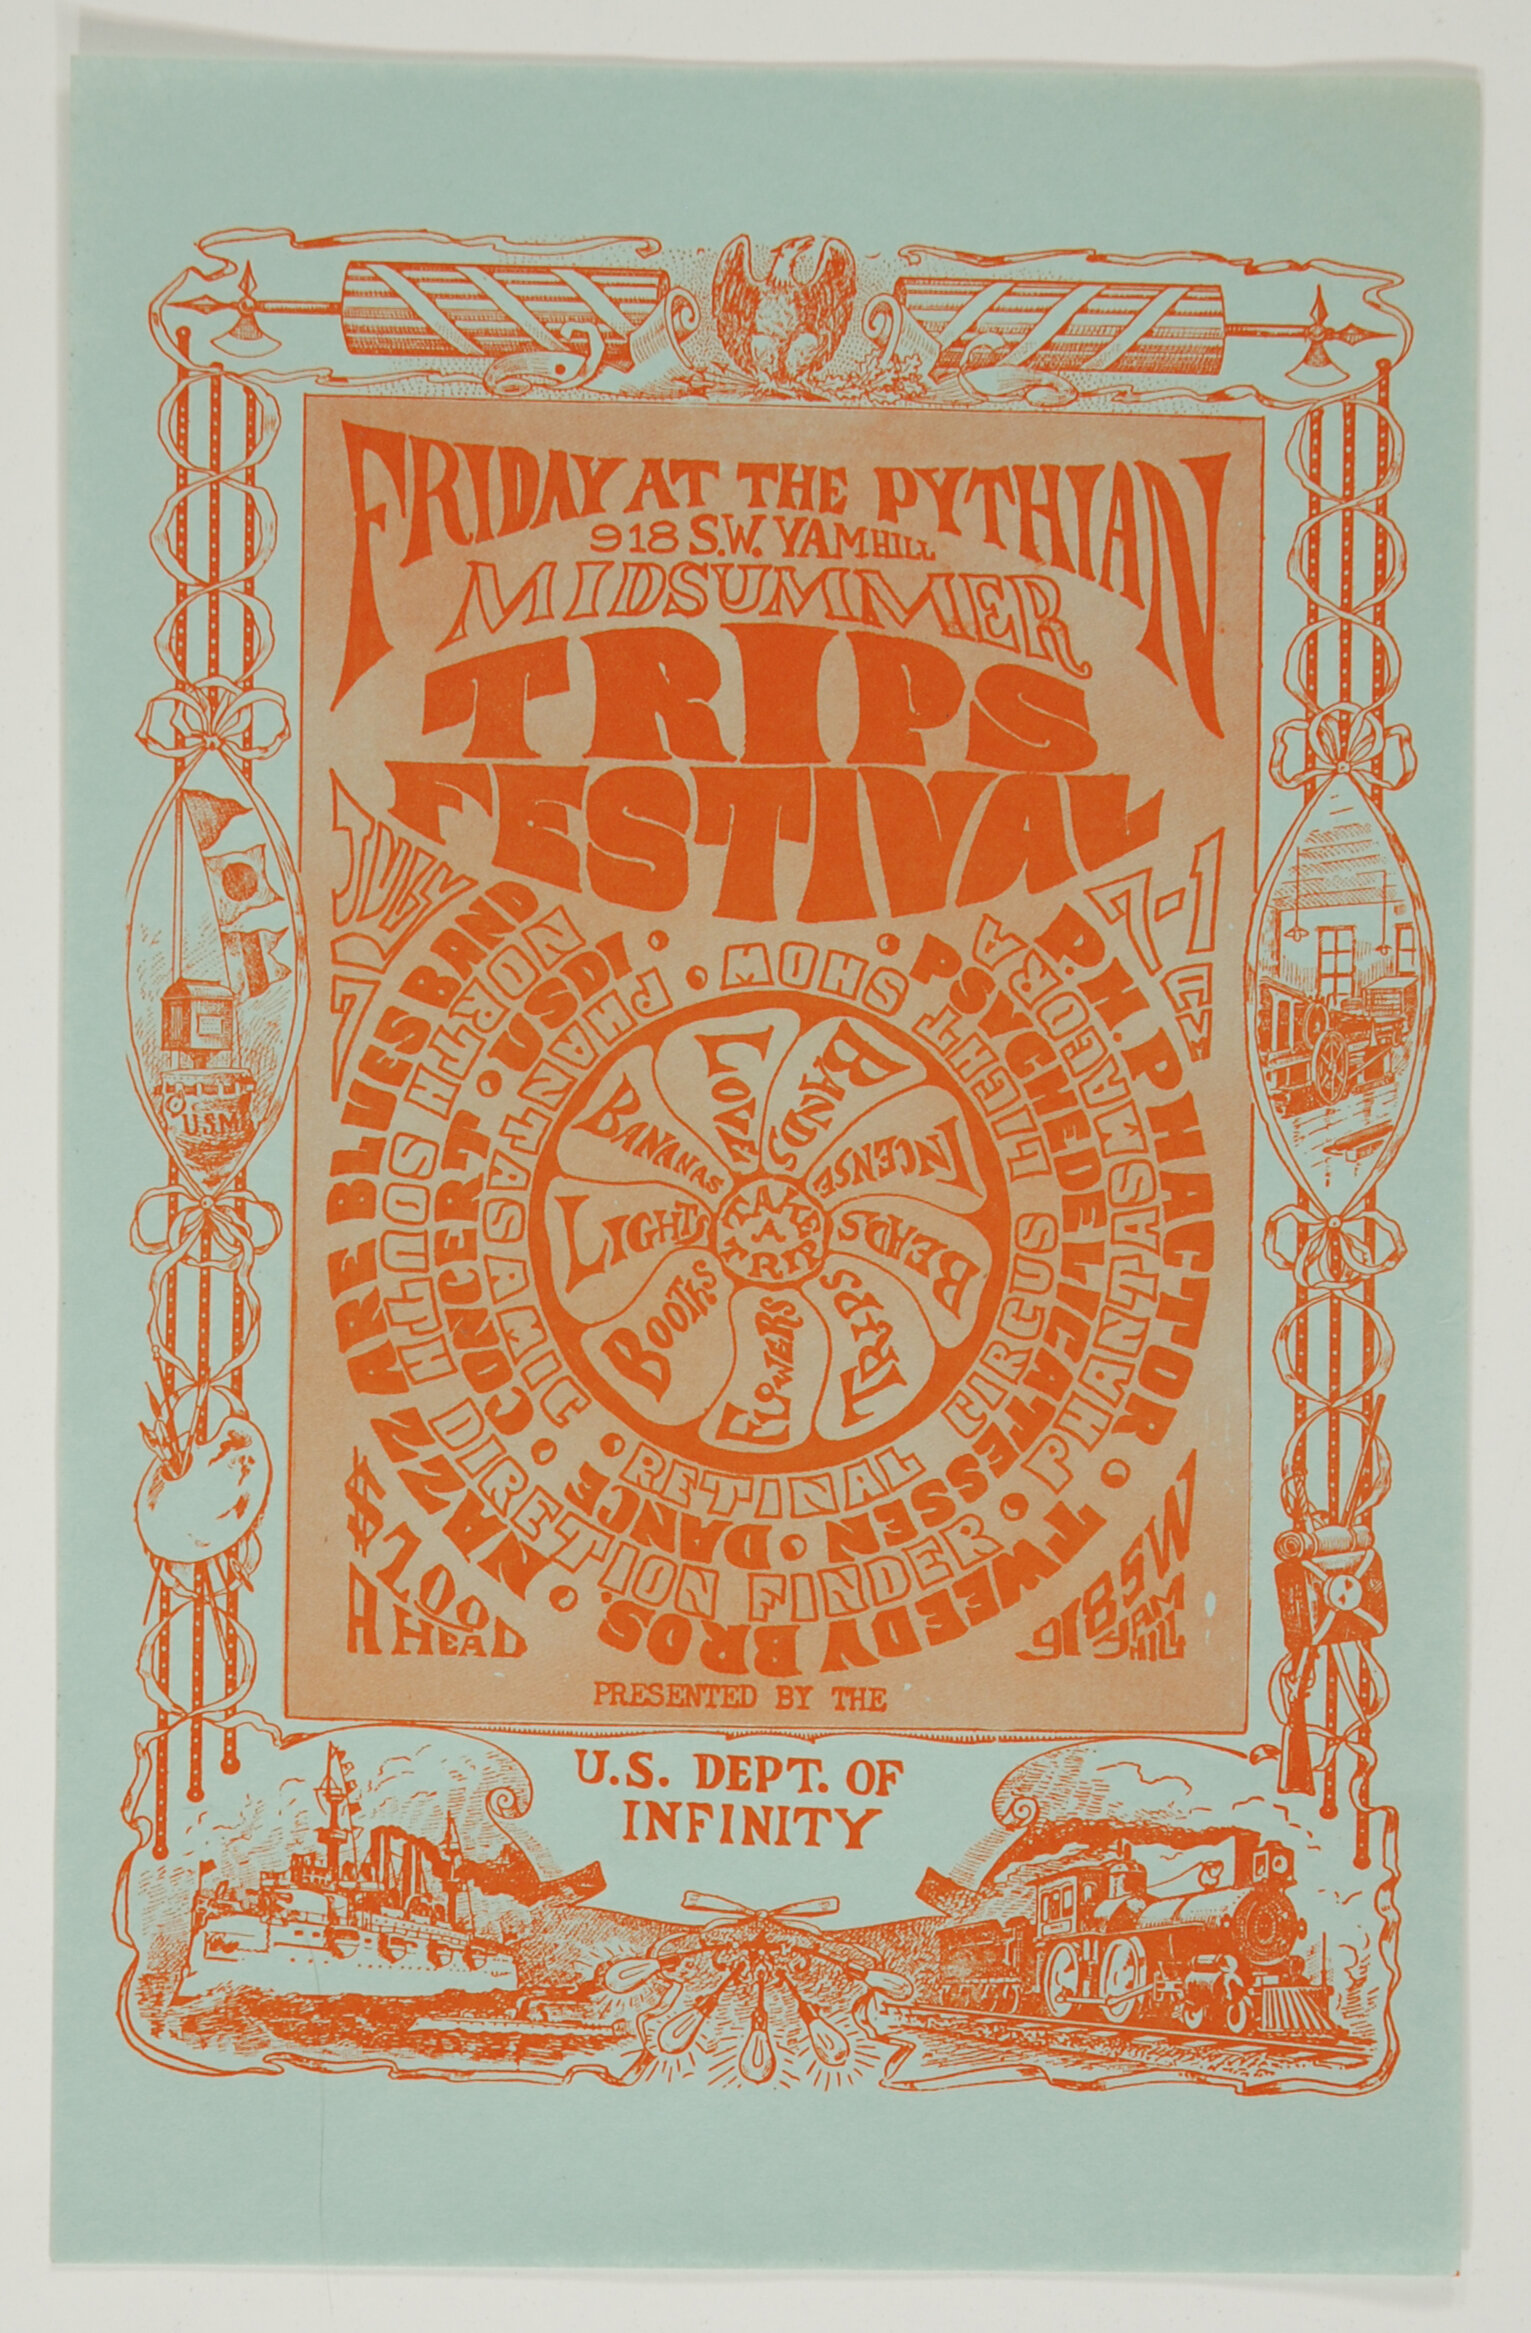 Turn on to the Trips Festival, New City Handbill